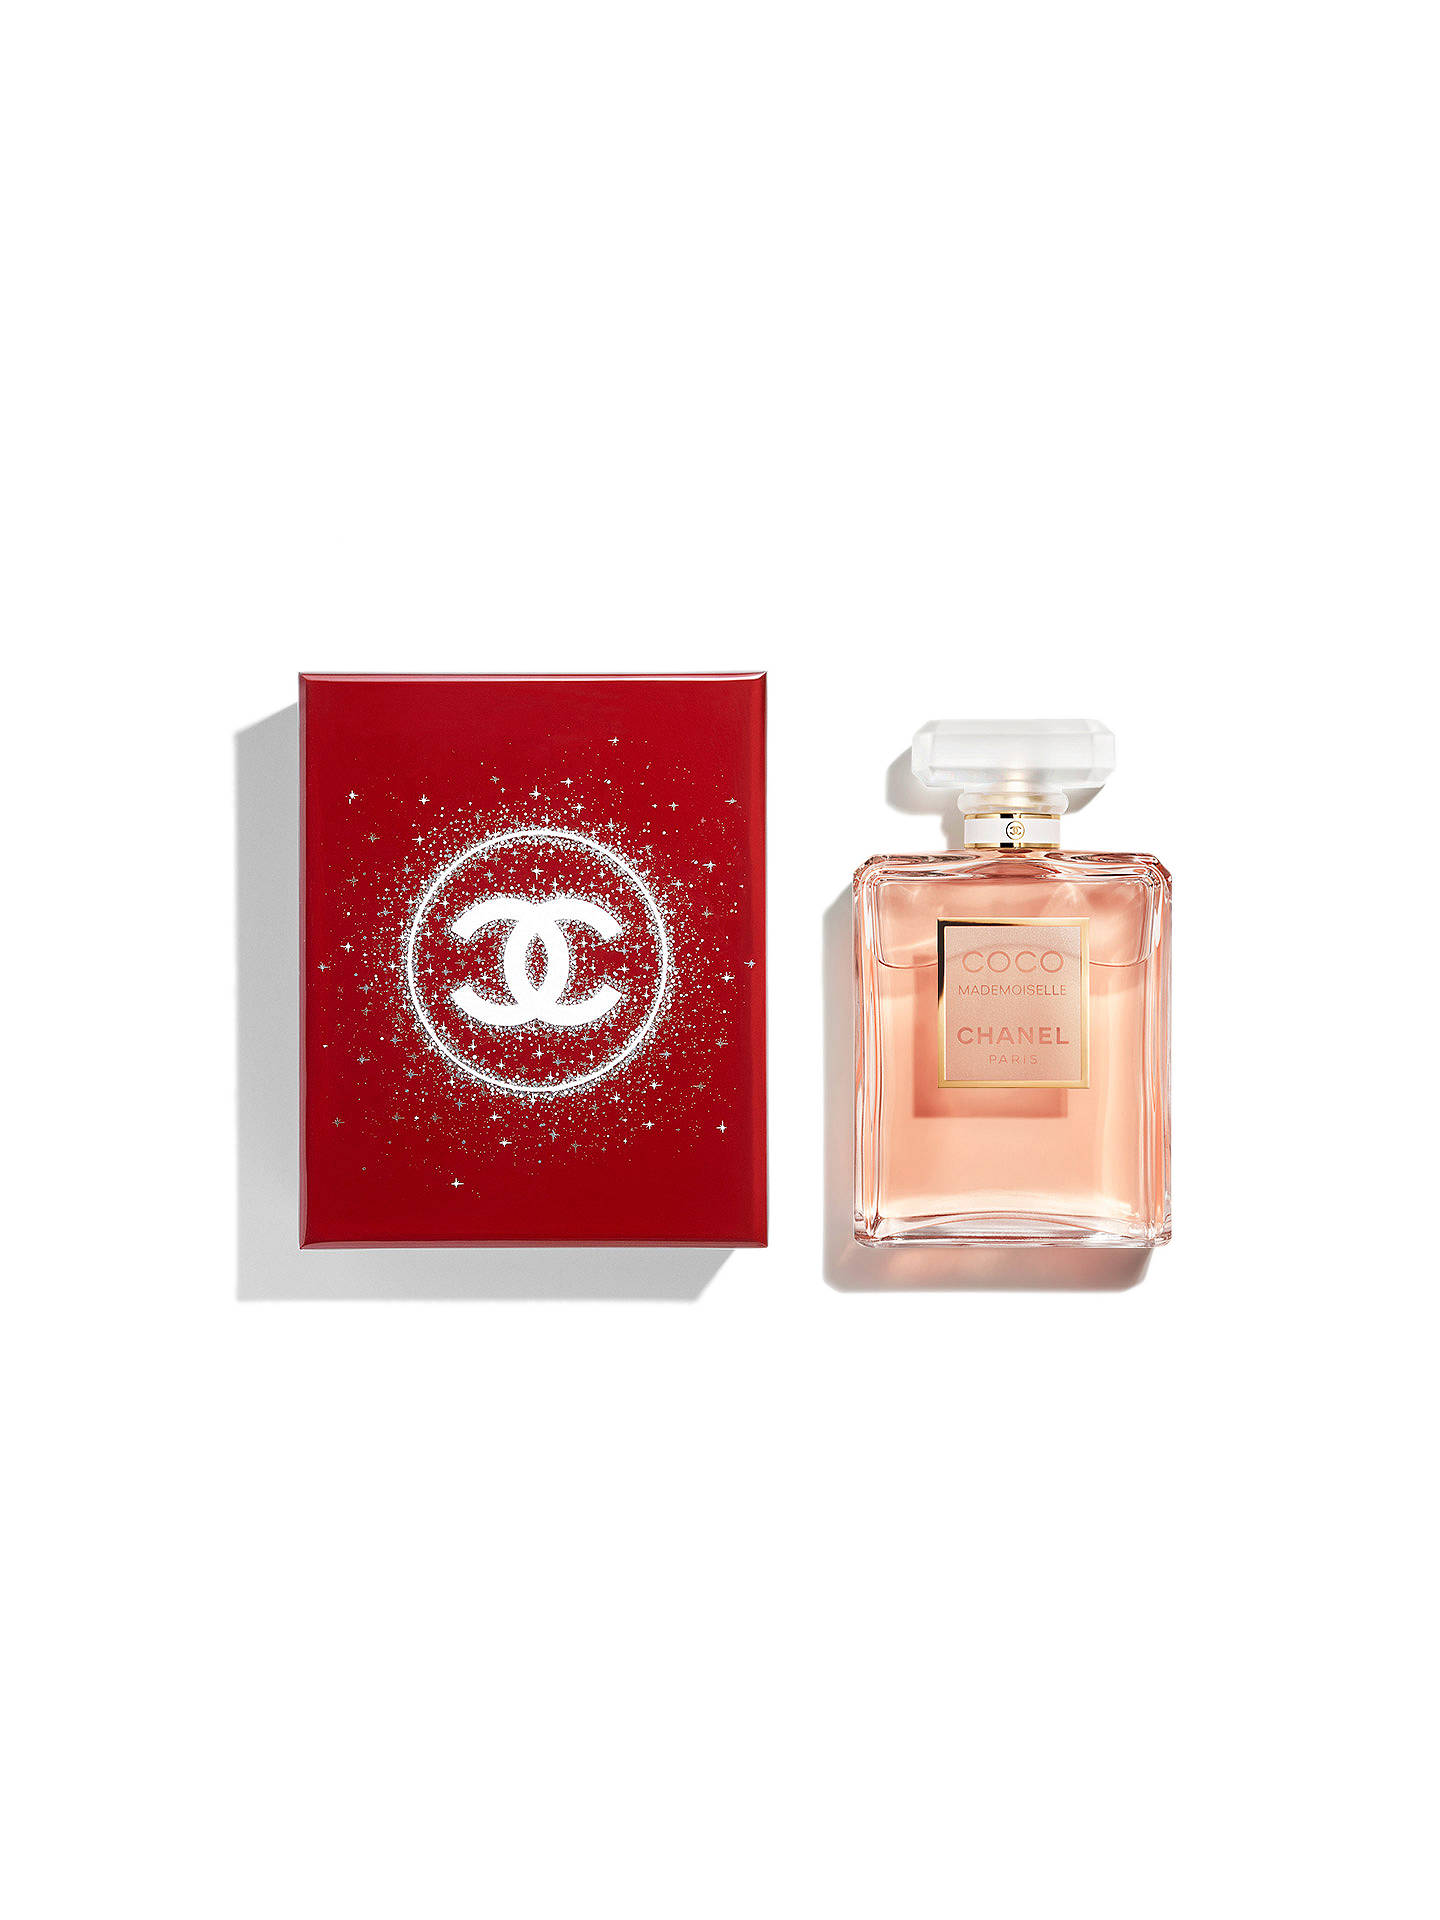 Chanel Coco Mademoiselle Eau De Parfum Spray 100ml With Gift Box At Edp